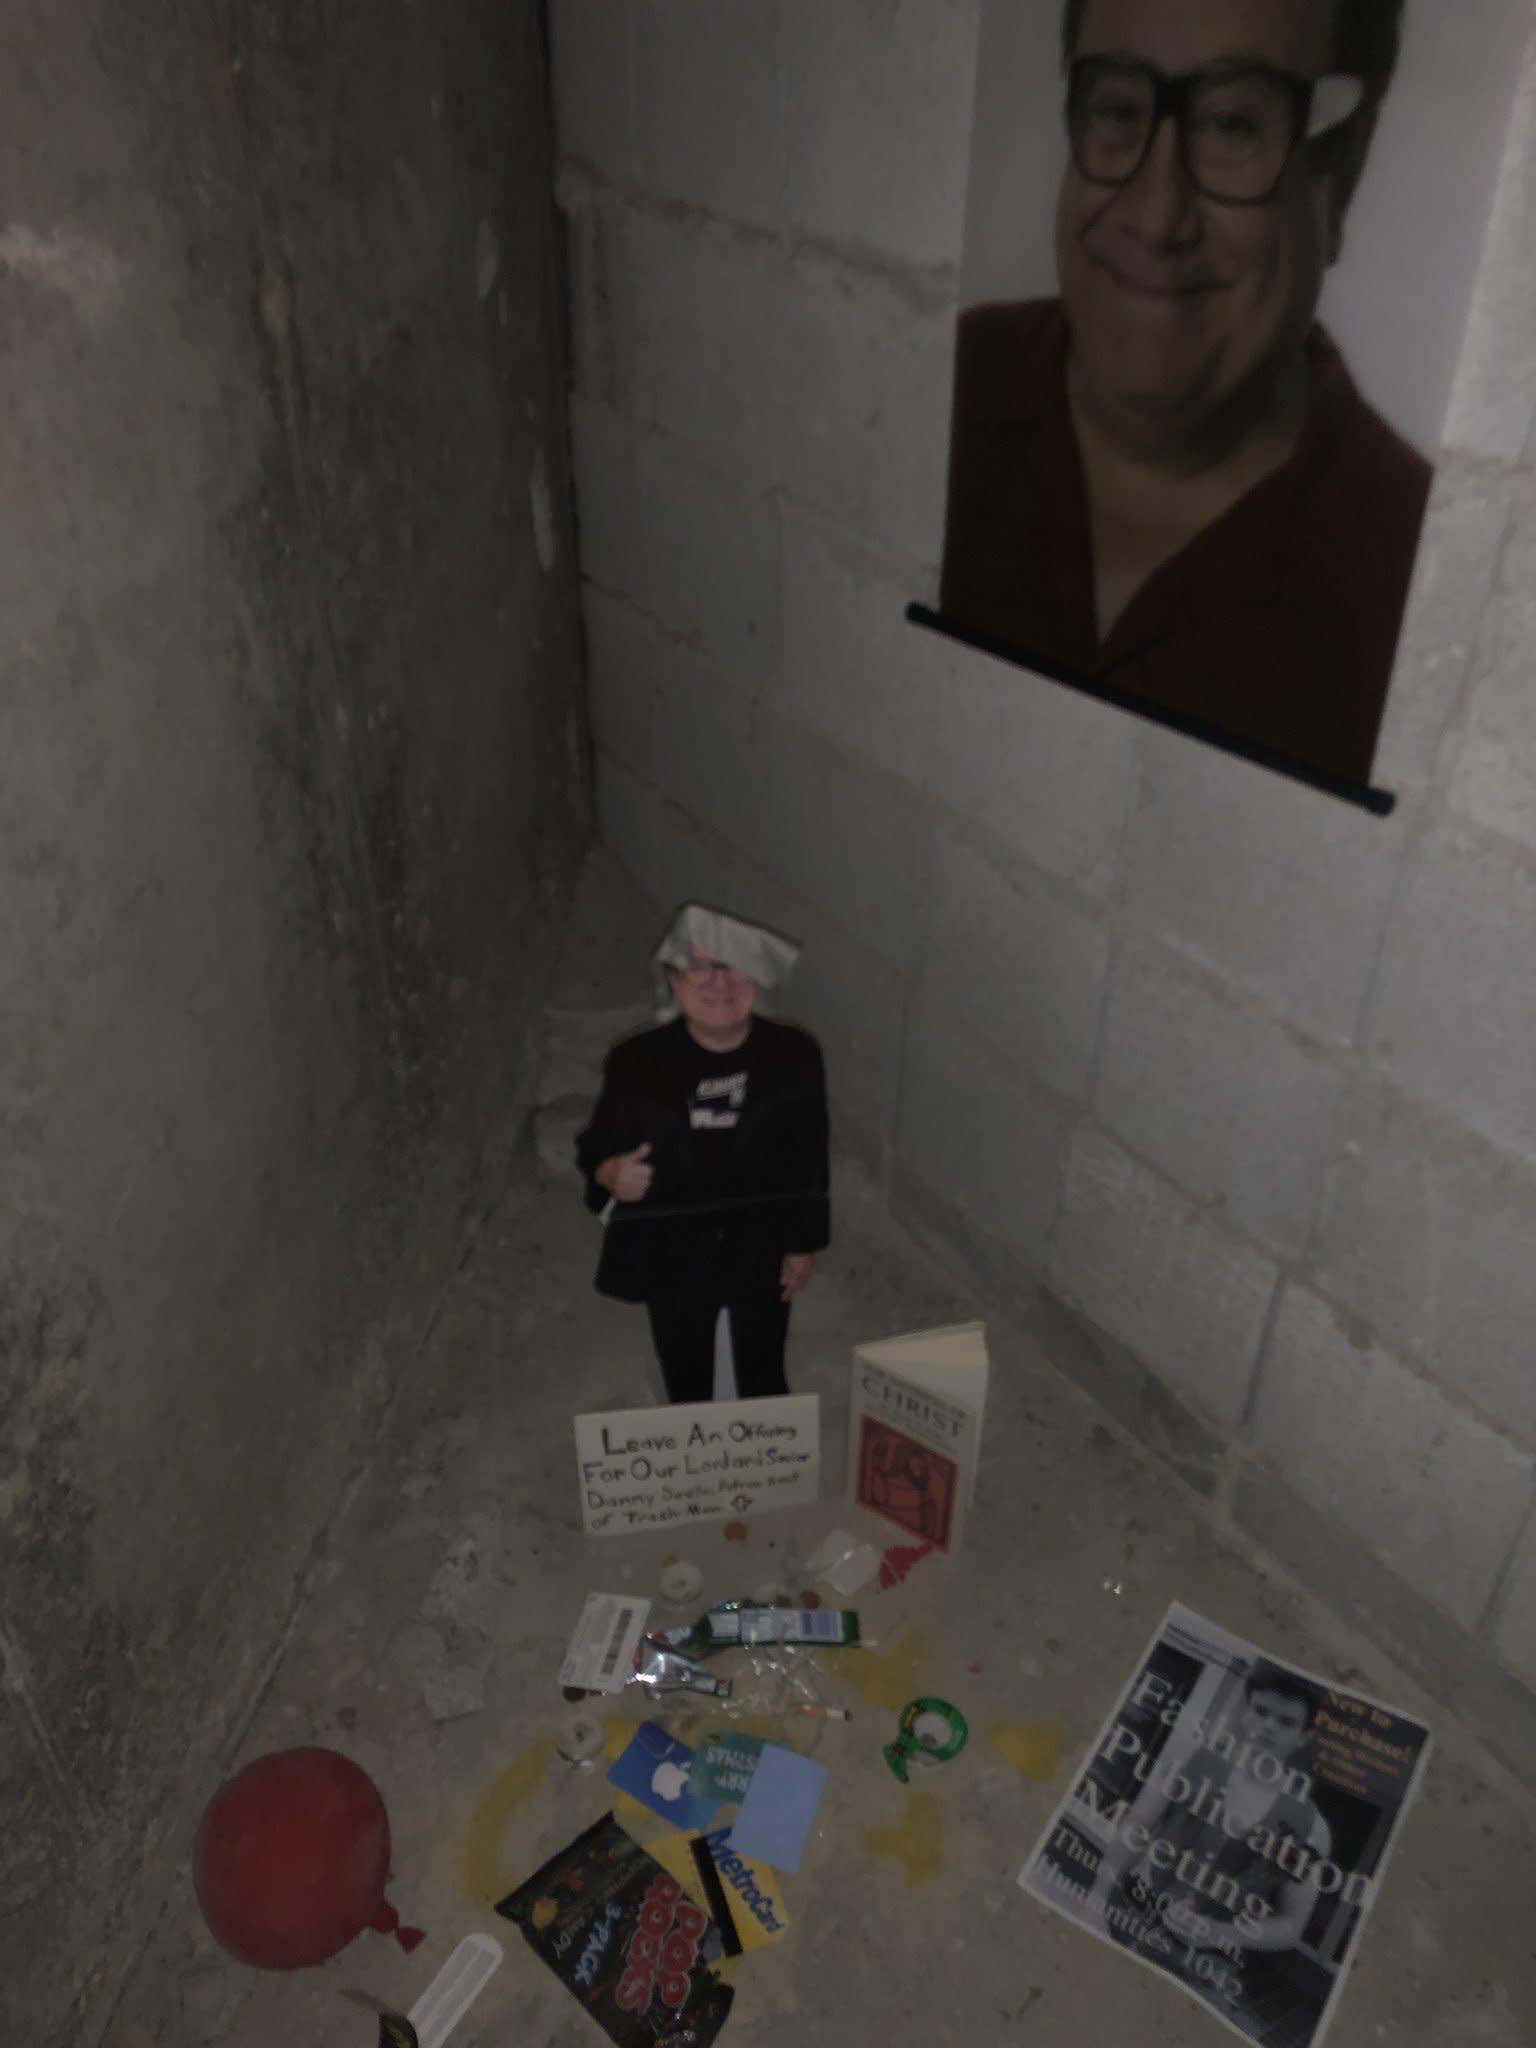 Story Emerges Behind Bathroom Shrine Of Danny Devito